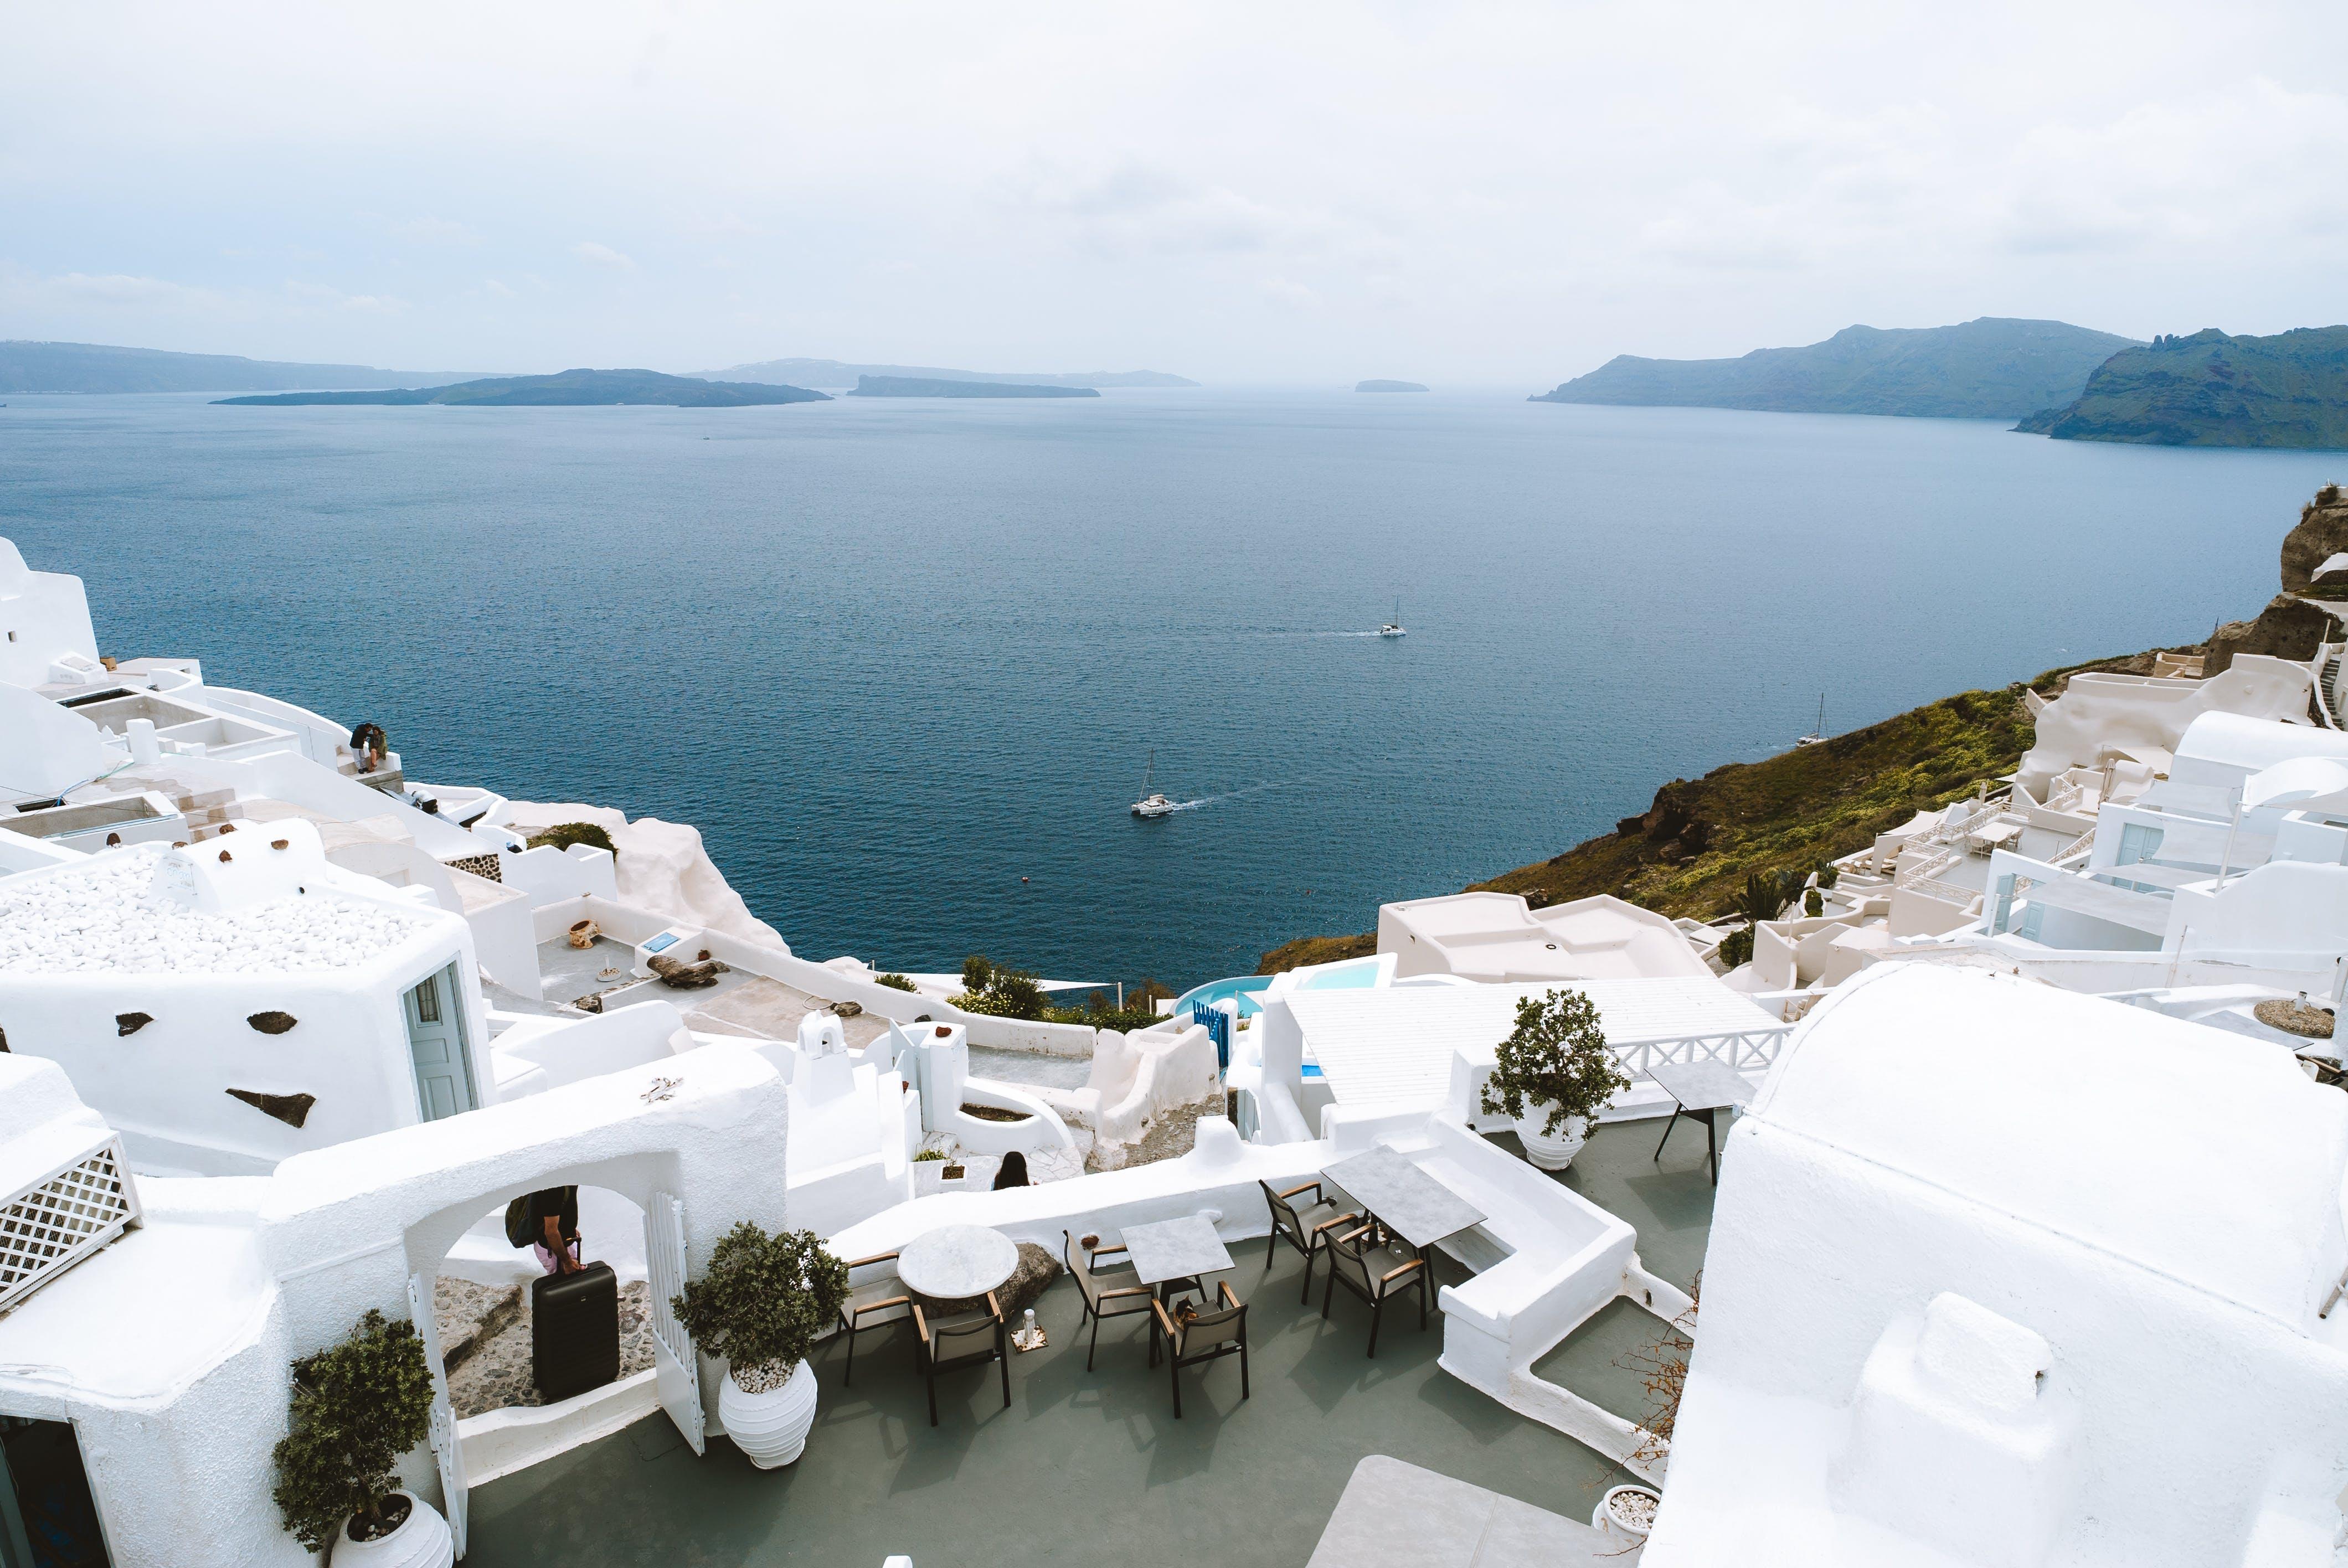 Immagine gratuita di acqua, architettura, azzurro, bagnasciuga